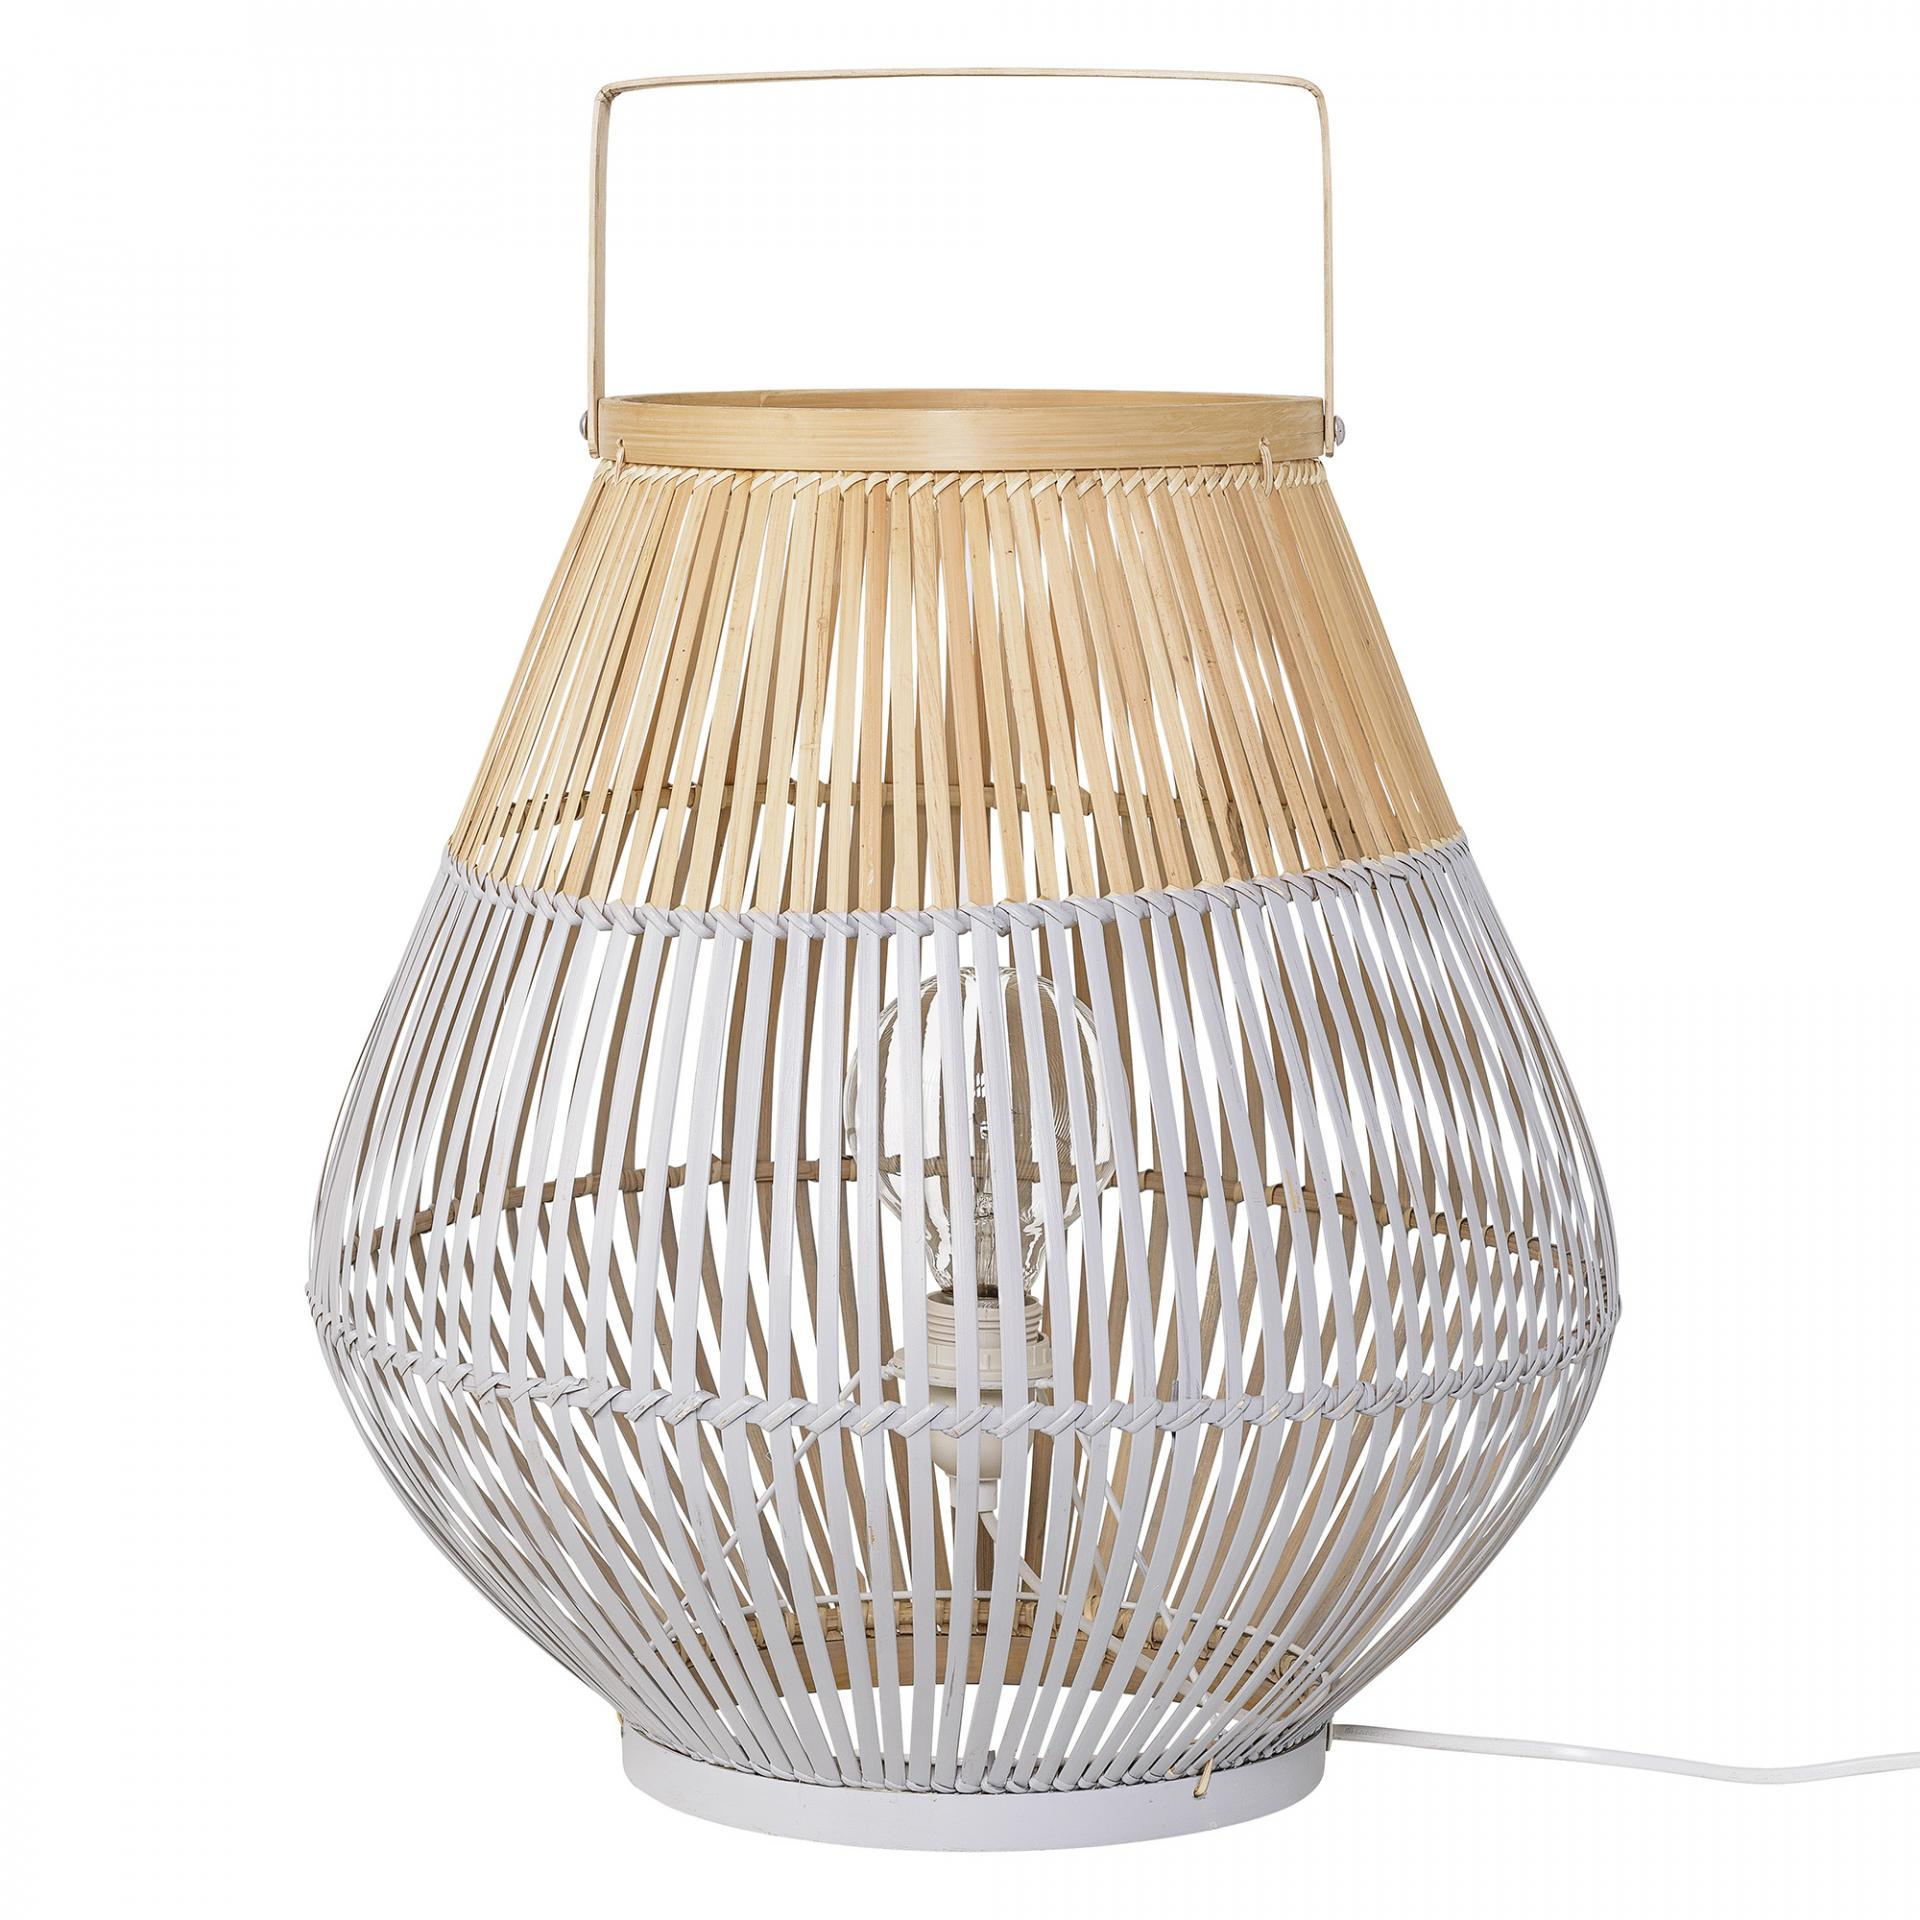 Bloomingville Stojací lampa Bamboo